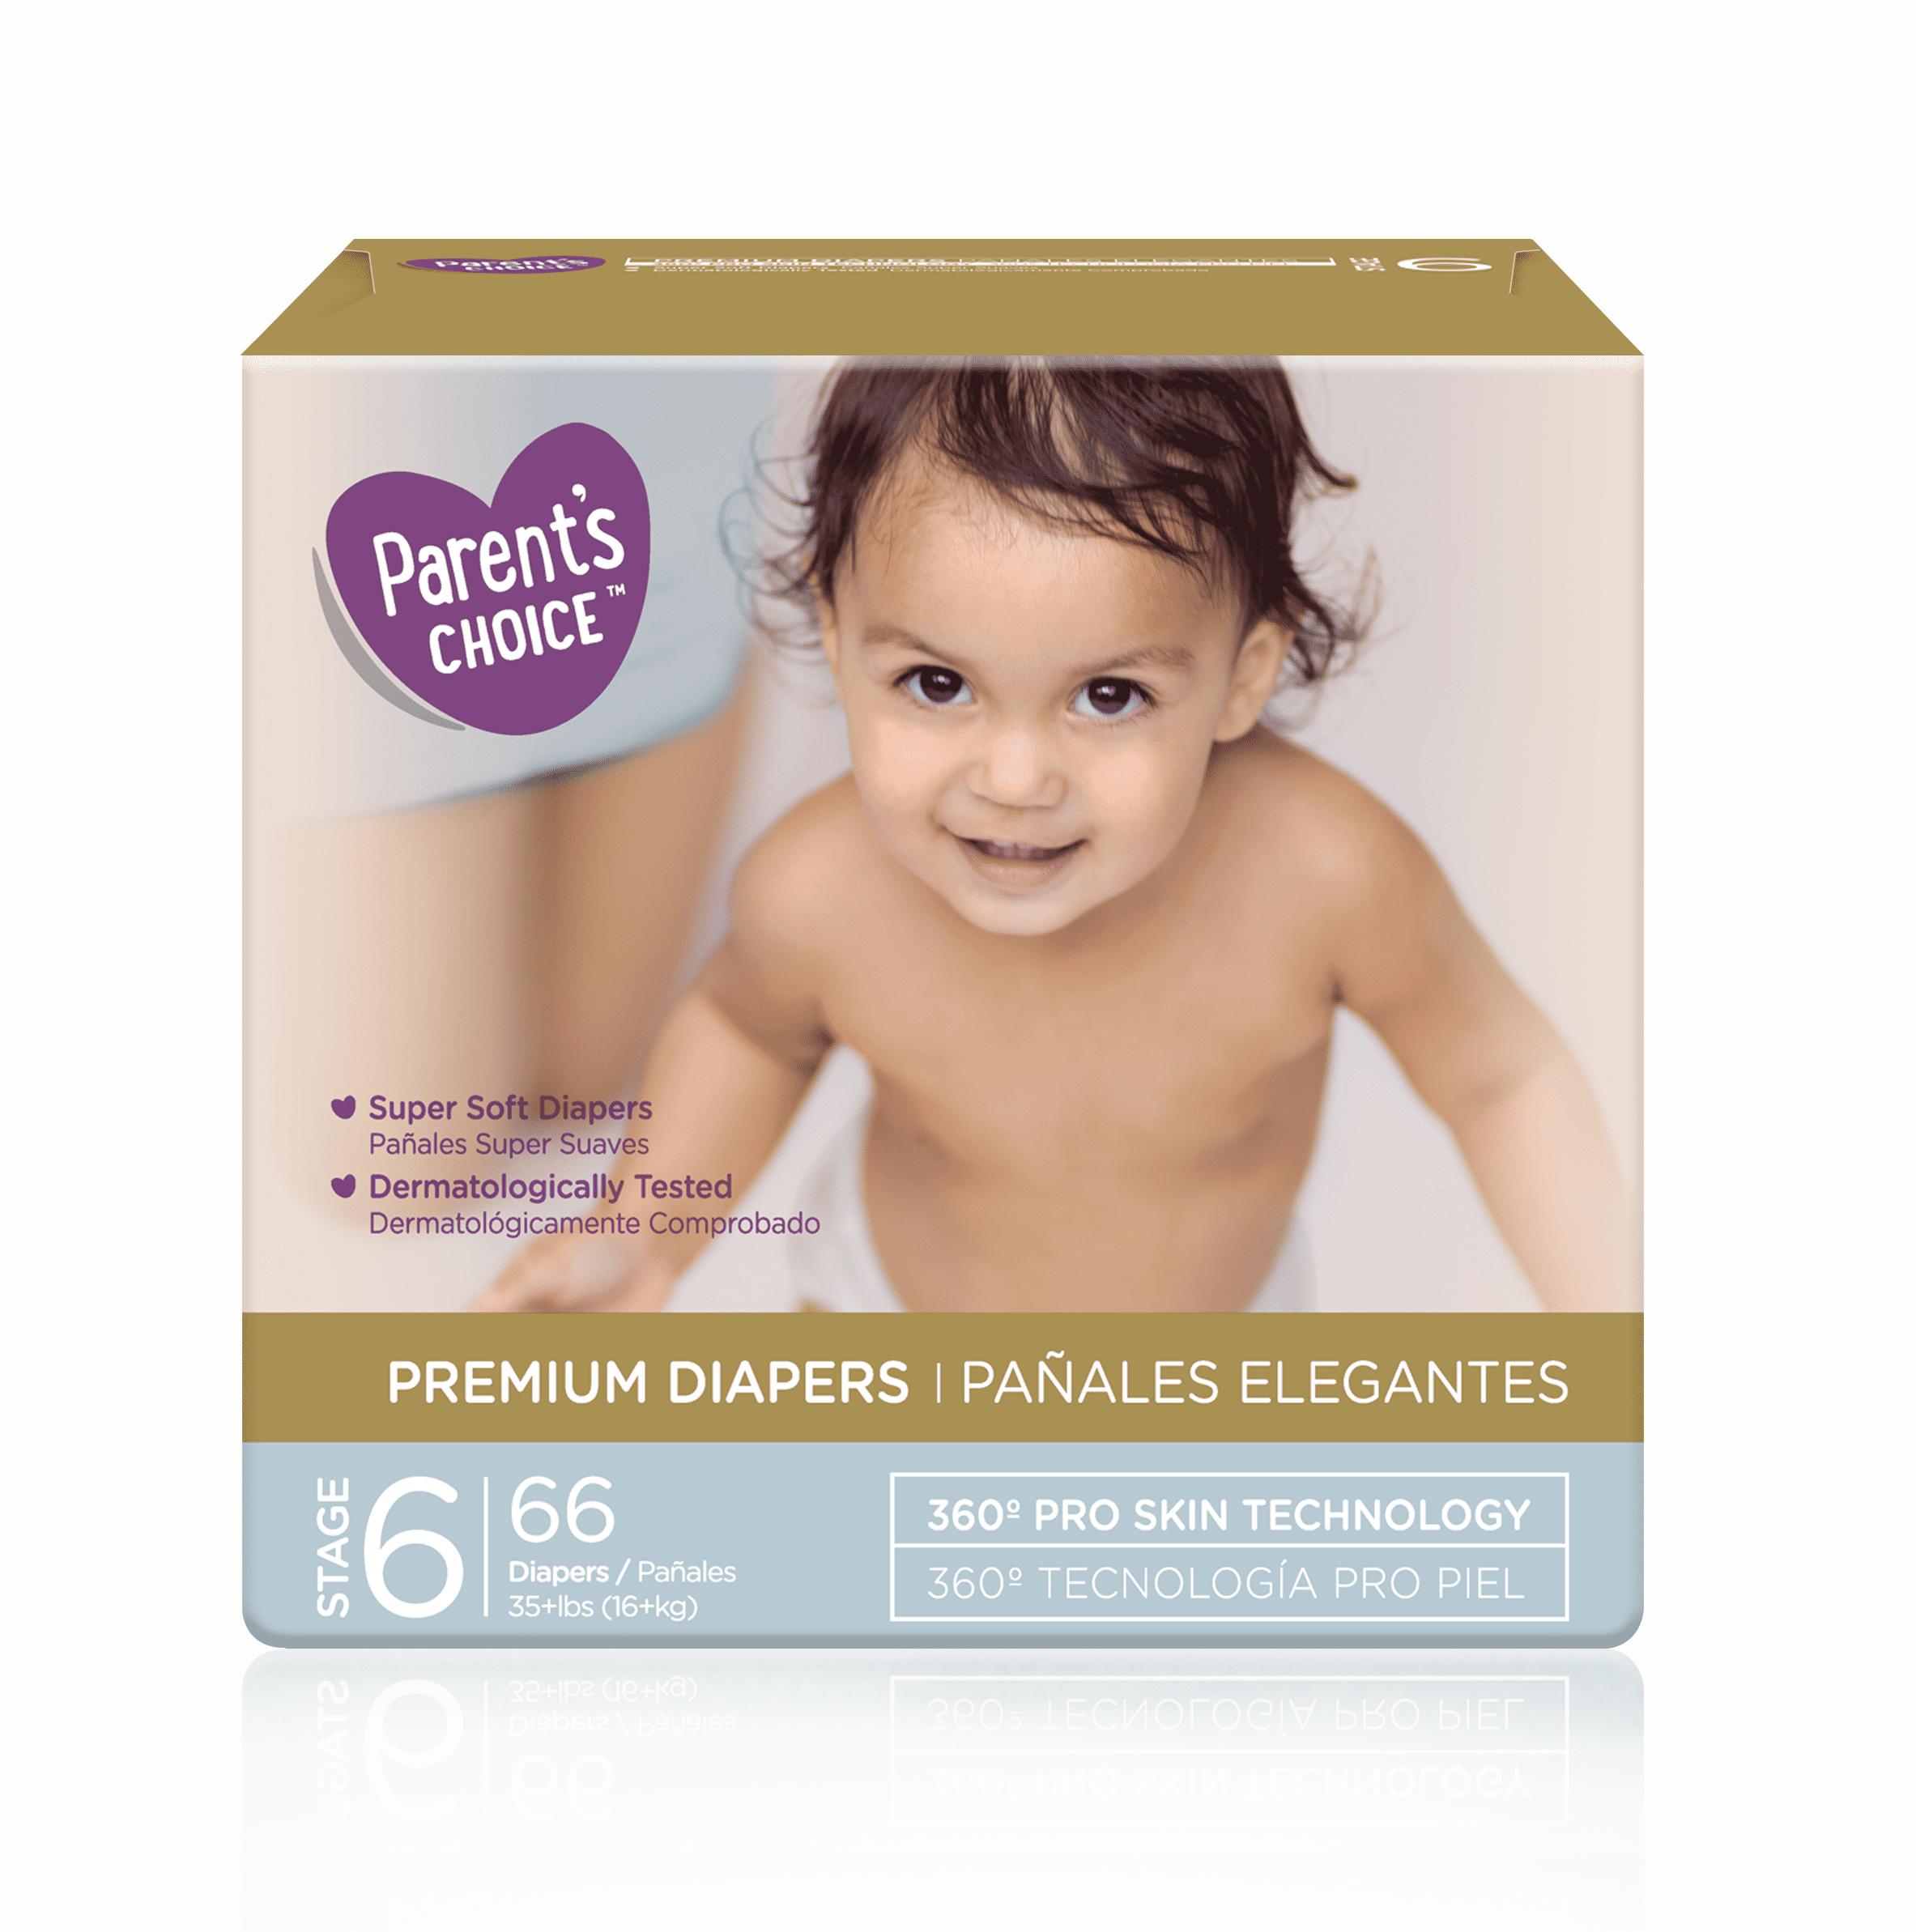 Parent's Choice Premium Diapers, Size 6, 66 Diapers